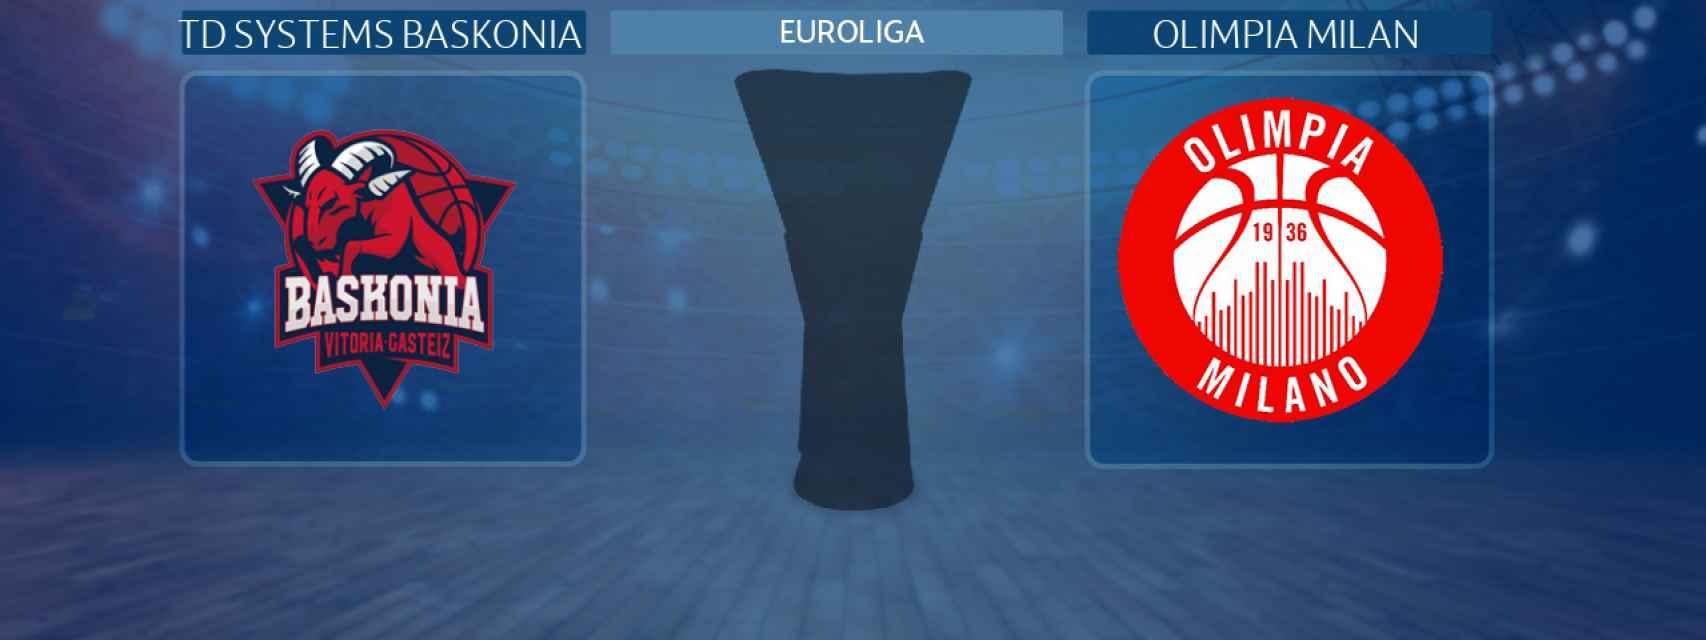 TD Systems Baskonia - Olimpia Milan, partido de la Euroliga